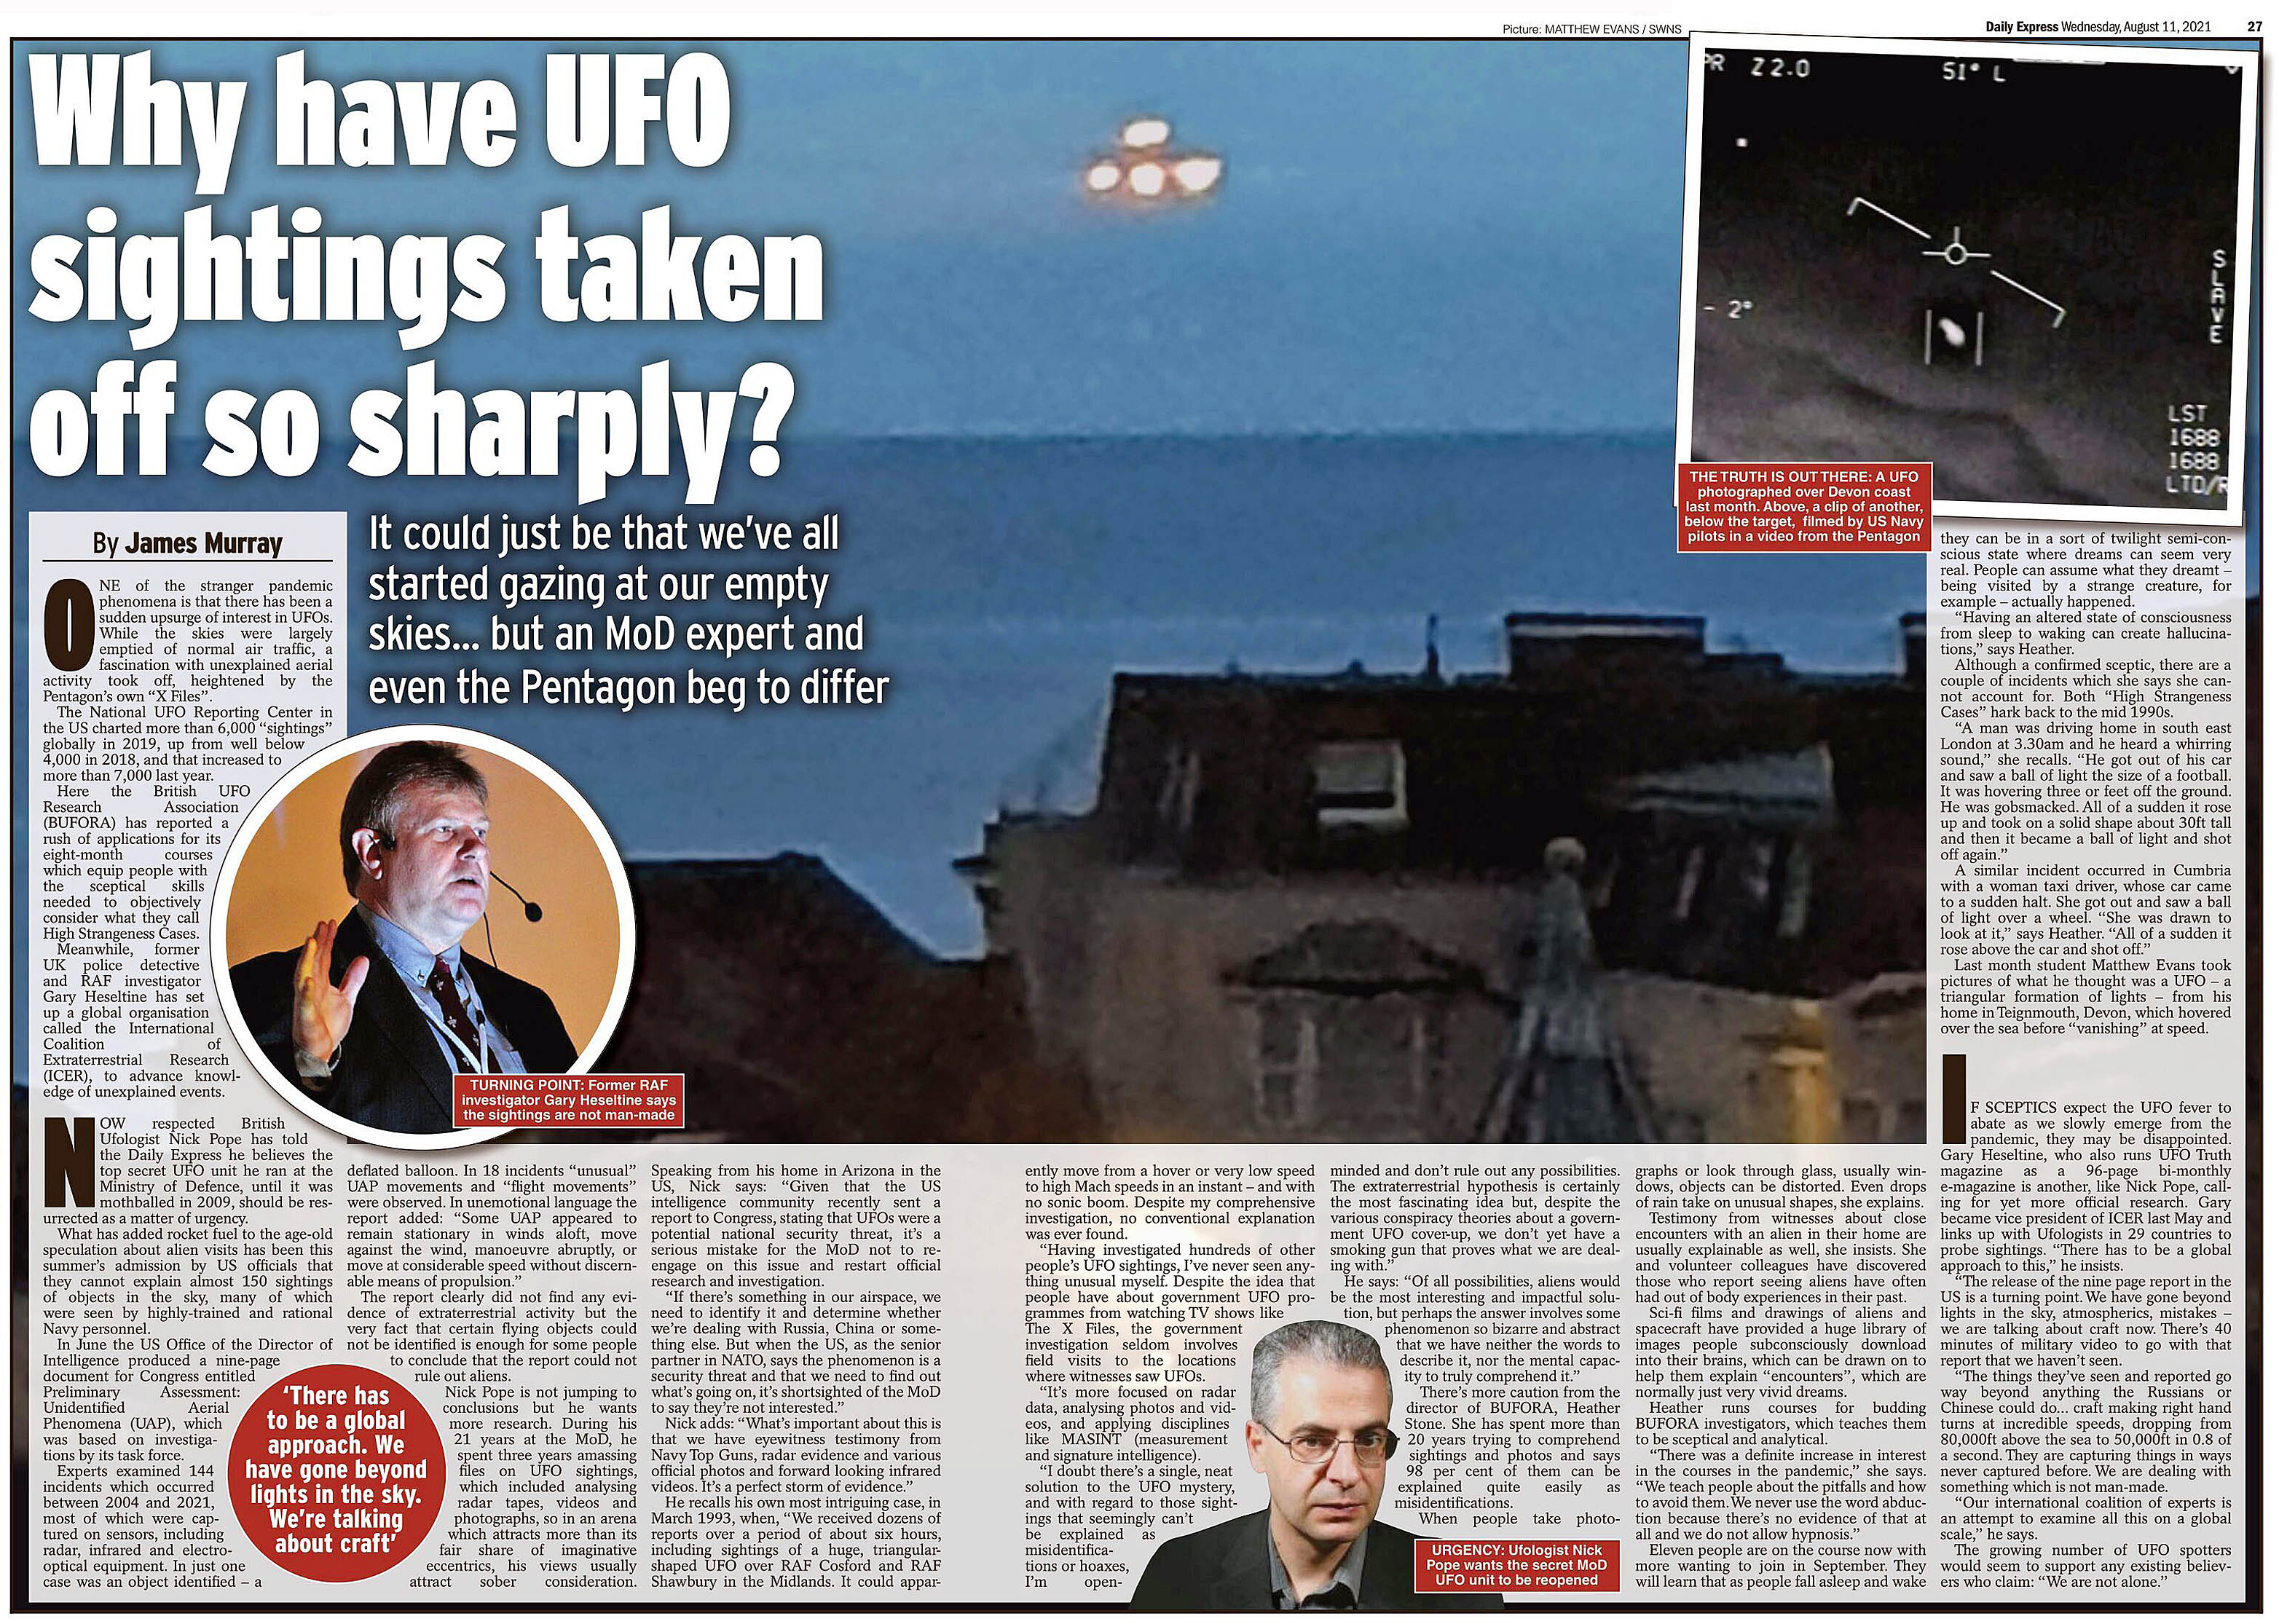 DExpress 210811 UFO.jpg